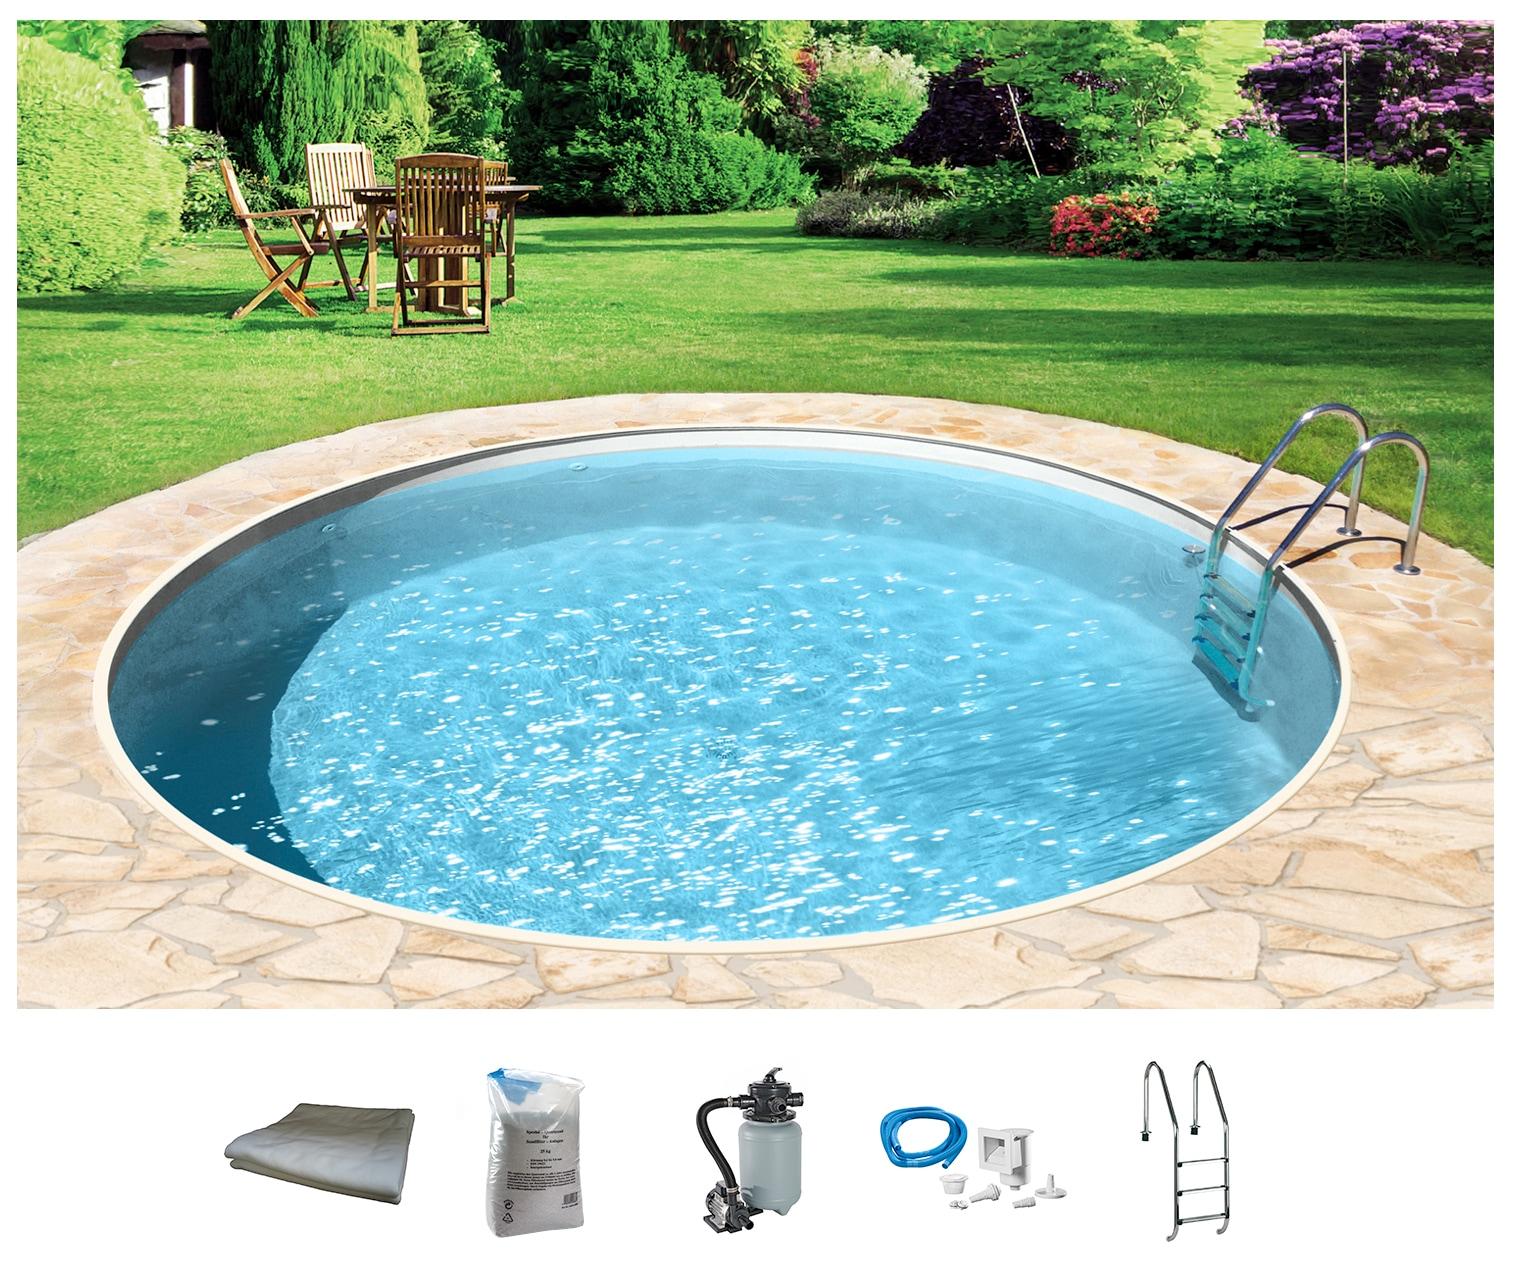 MYPOOL Set: Rundpool 6-tlg., ØxH: 350x120 cm | Garten > Swimmingpools > Schwimmbecken | Weiß | Edelstahl | MYPOOL